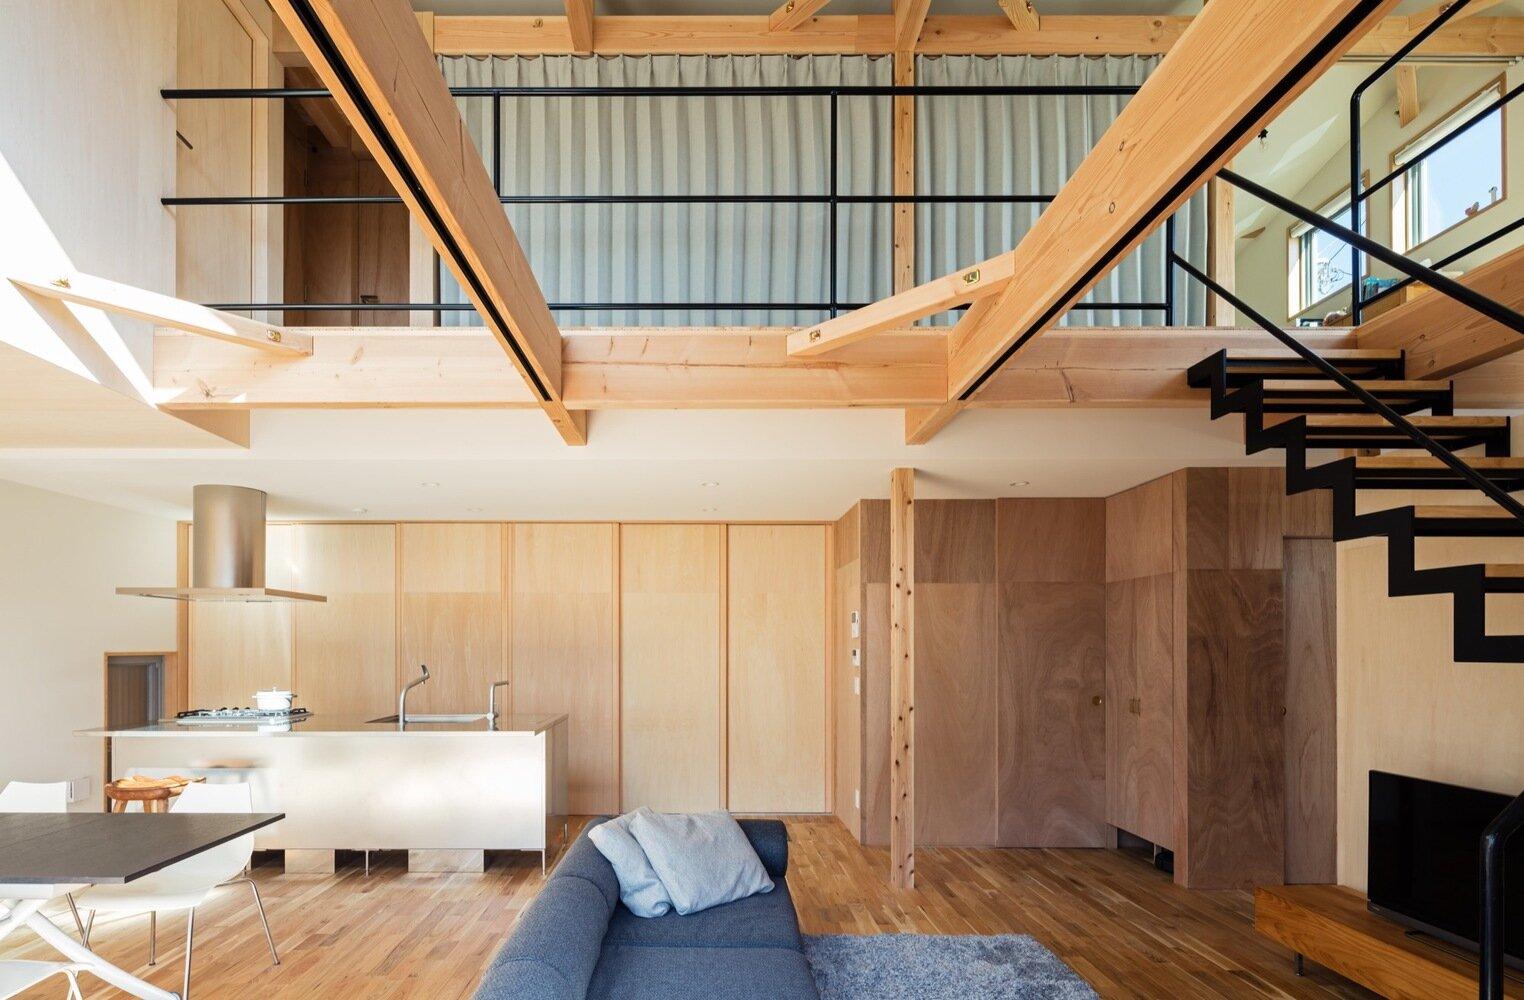 S-House - Coil Kazuteru Matumura Architects - Japan - Living Room - Humble Homes